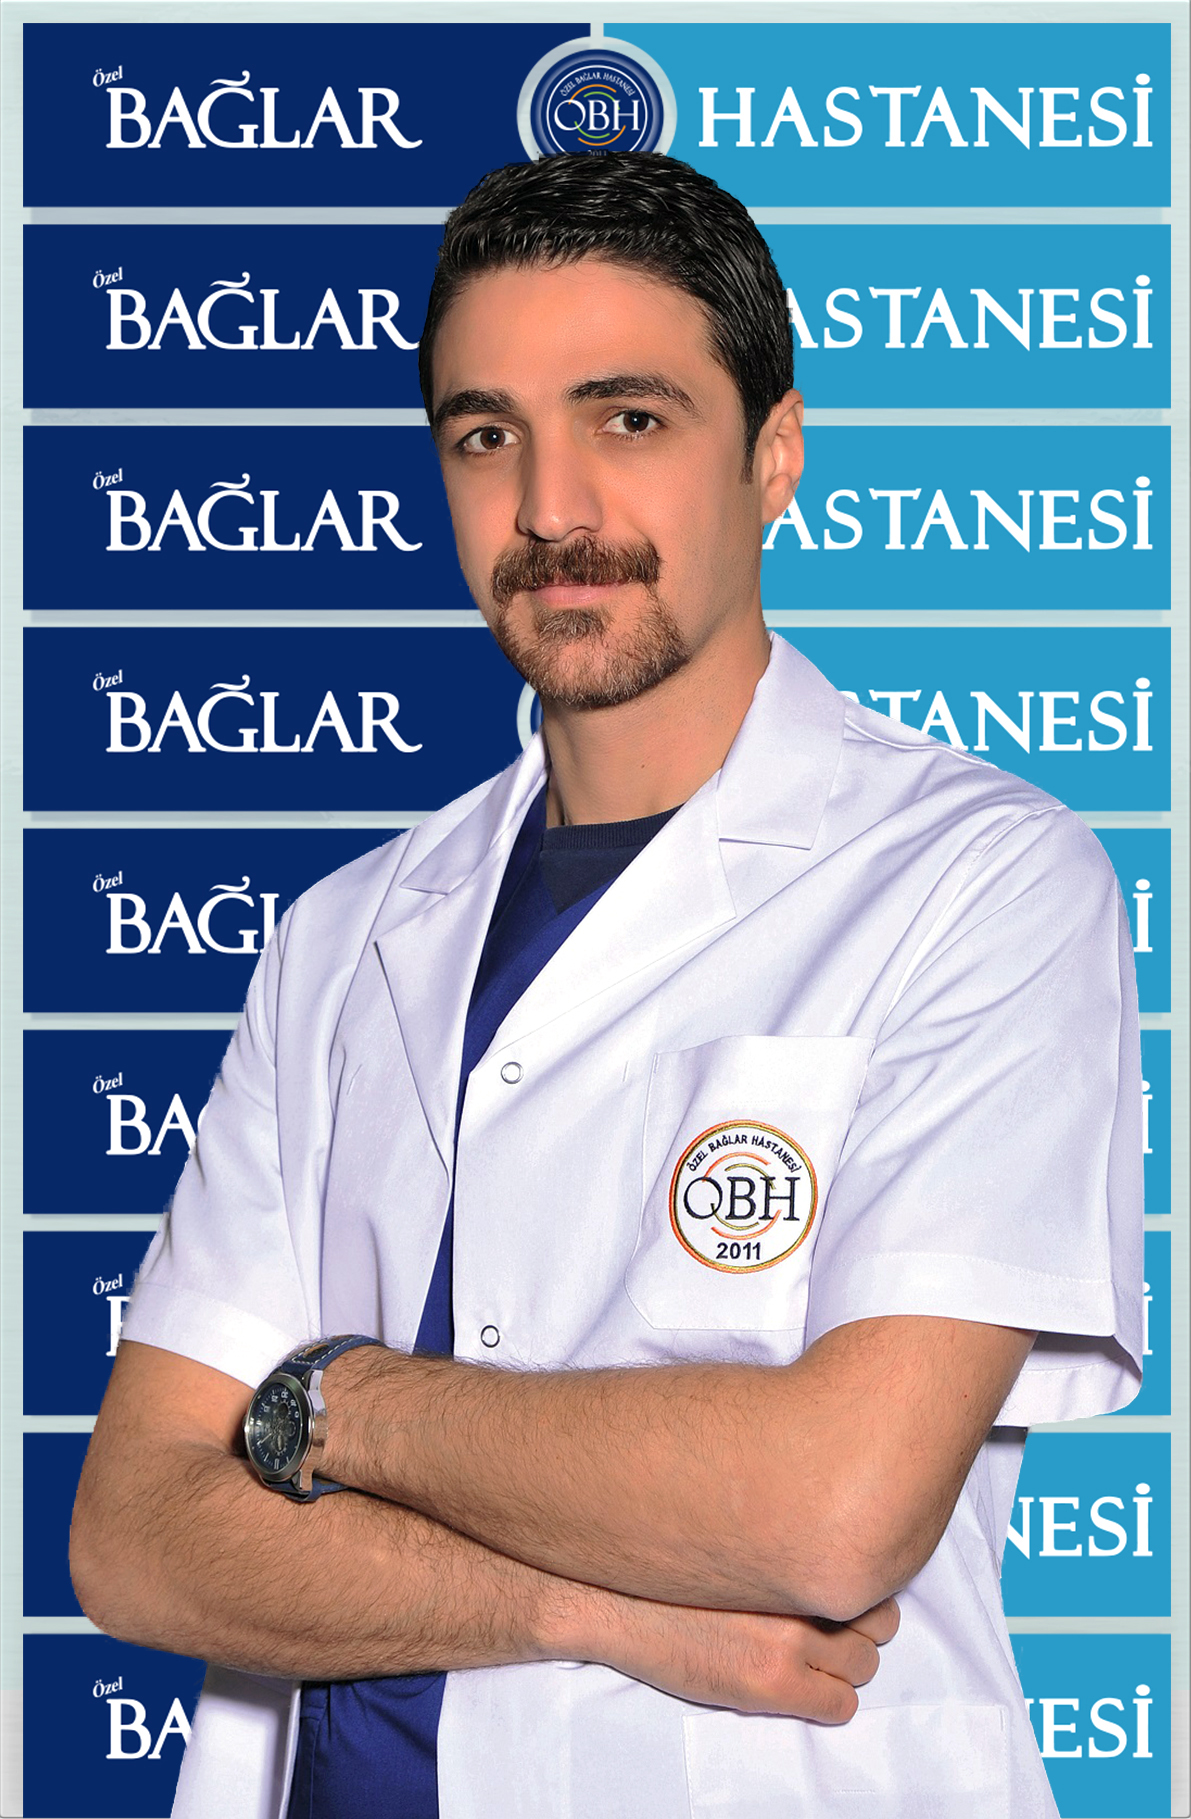 Uzm. Dr. Burhan Baykara Web